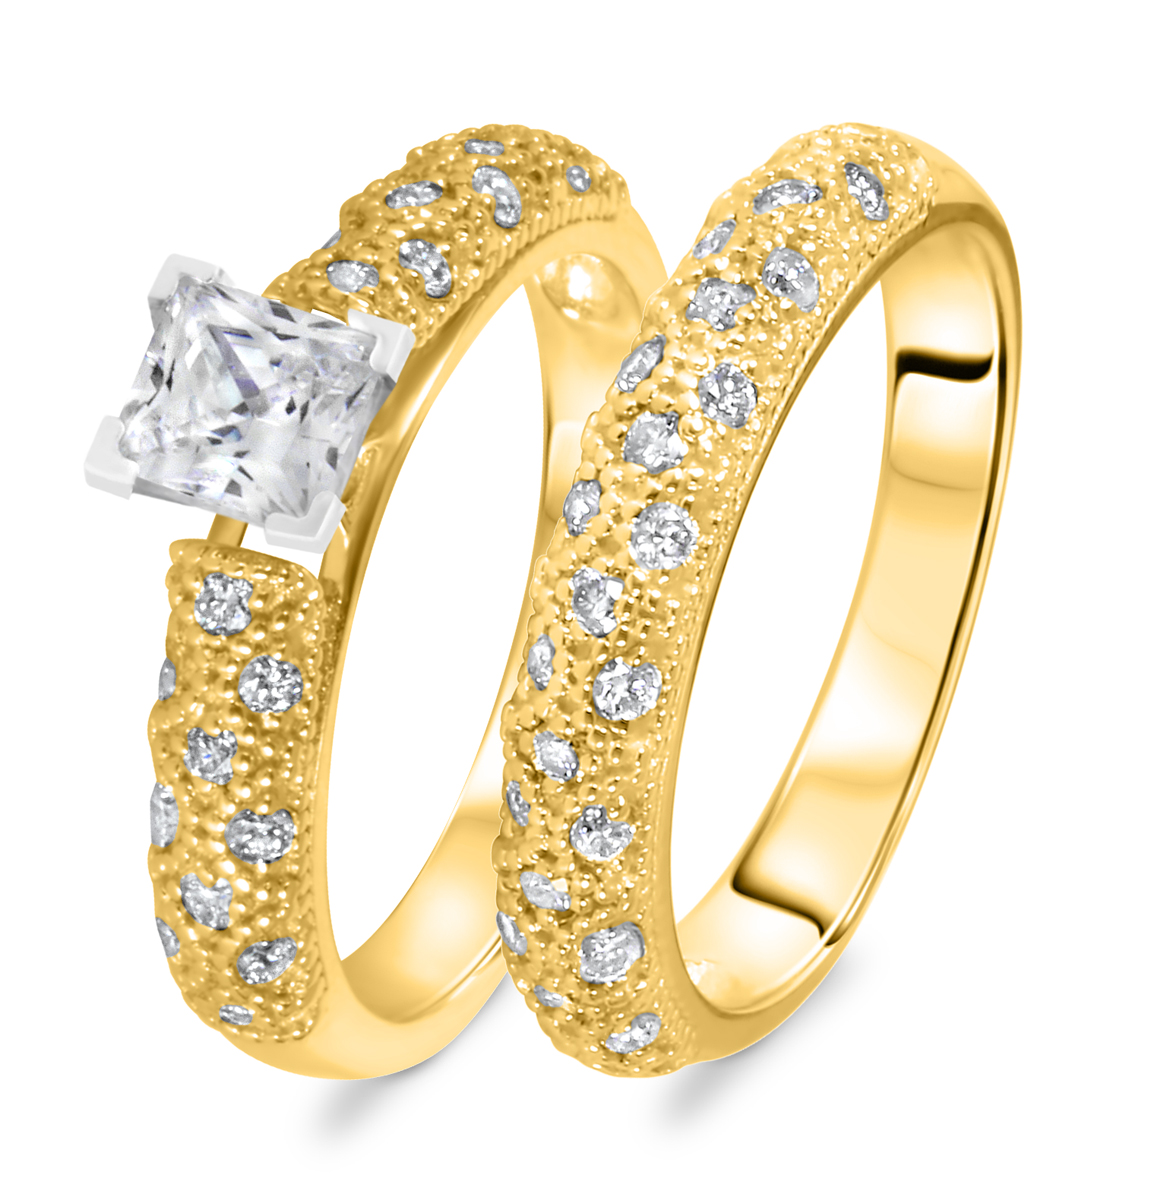 1 1/5 CT. T.W. Diamond Women's Bridal Wedding Ring Set 14K Yellow Gold